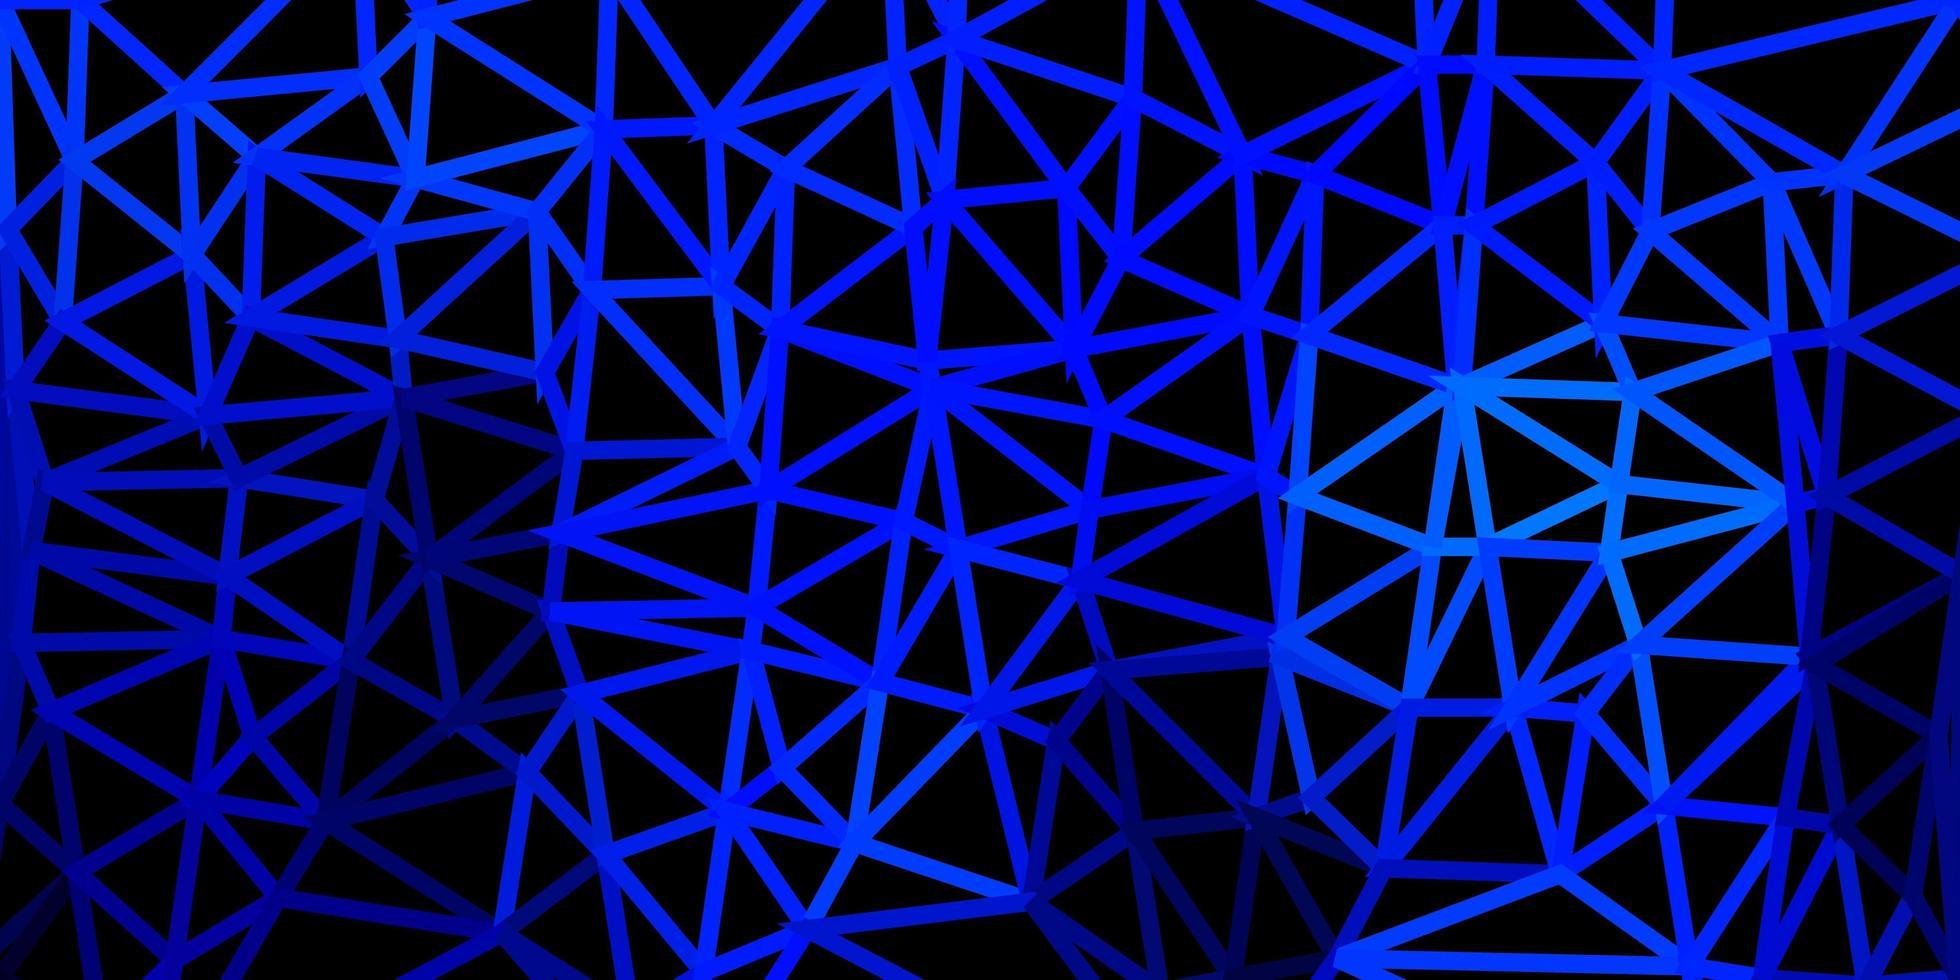 lichtblauwe vector kleurovergang veelhoek lay-out.